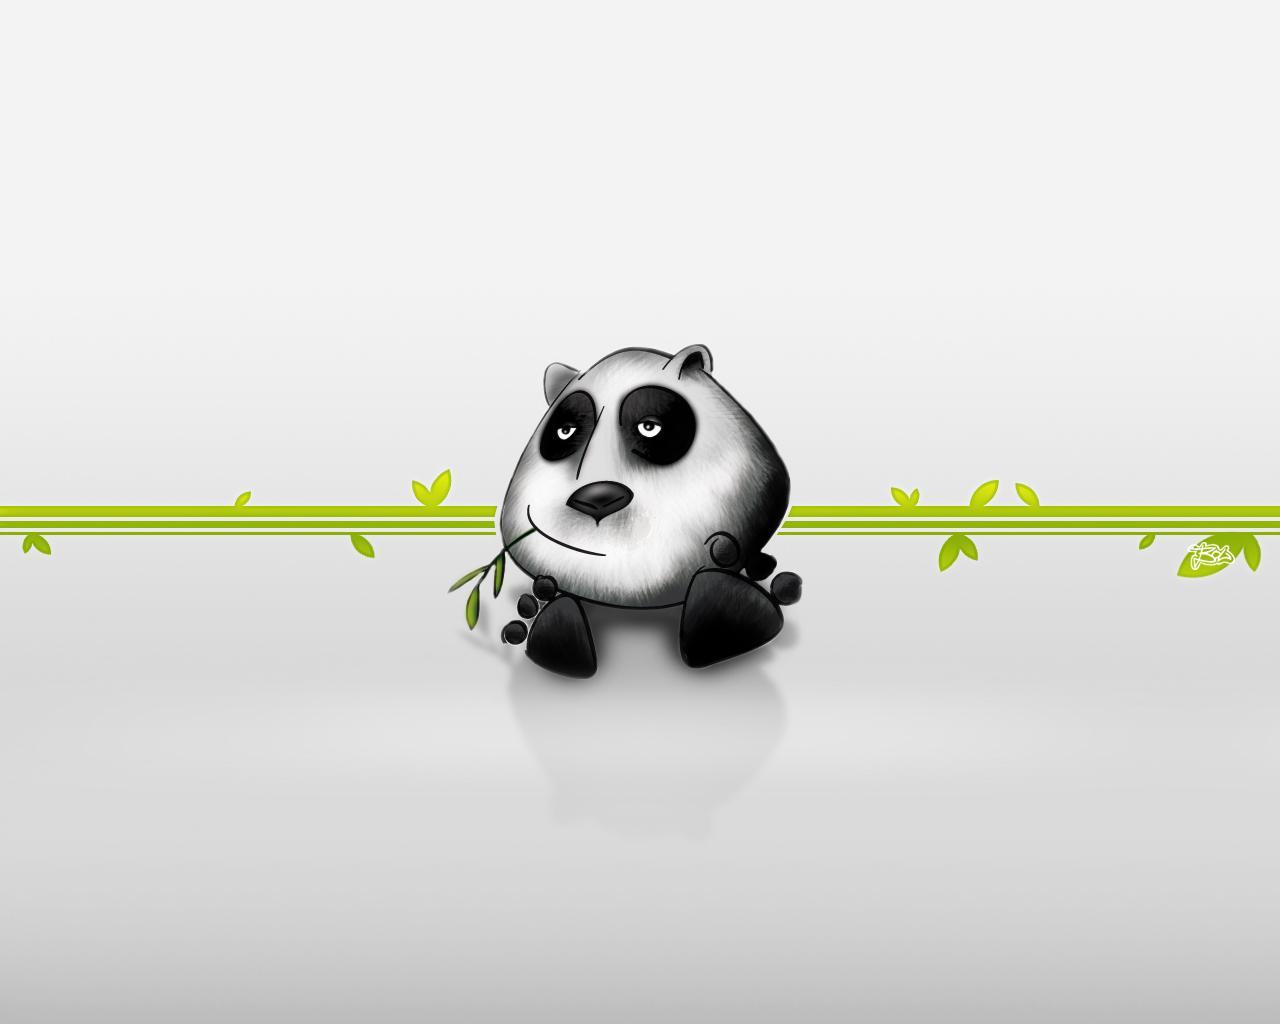 Top 101 Reviews Funny Wallpapers Desktop Backgrounds 1280x1024